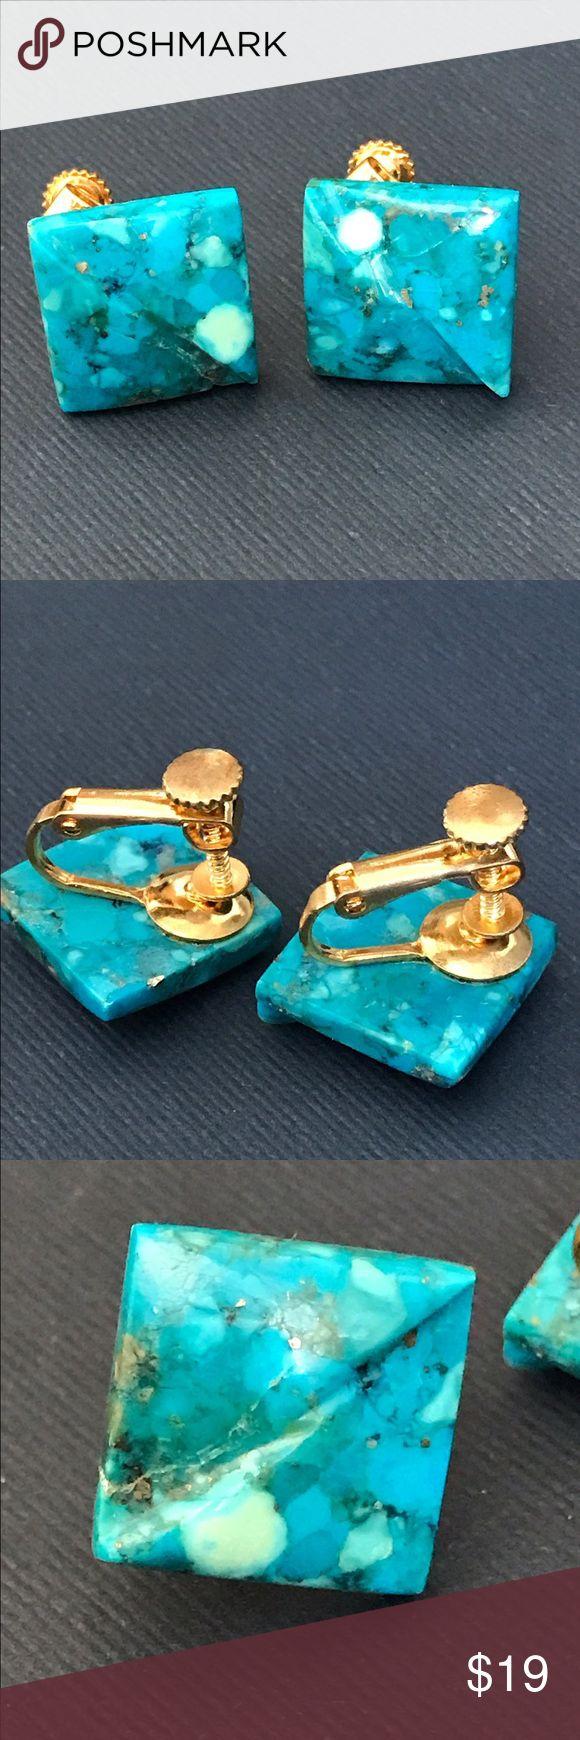 Vintage turquoise square screw back earrings Beautiful turquoise, vintage screw back earrings Vintage Jewelry Earrings